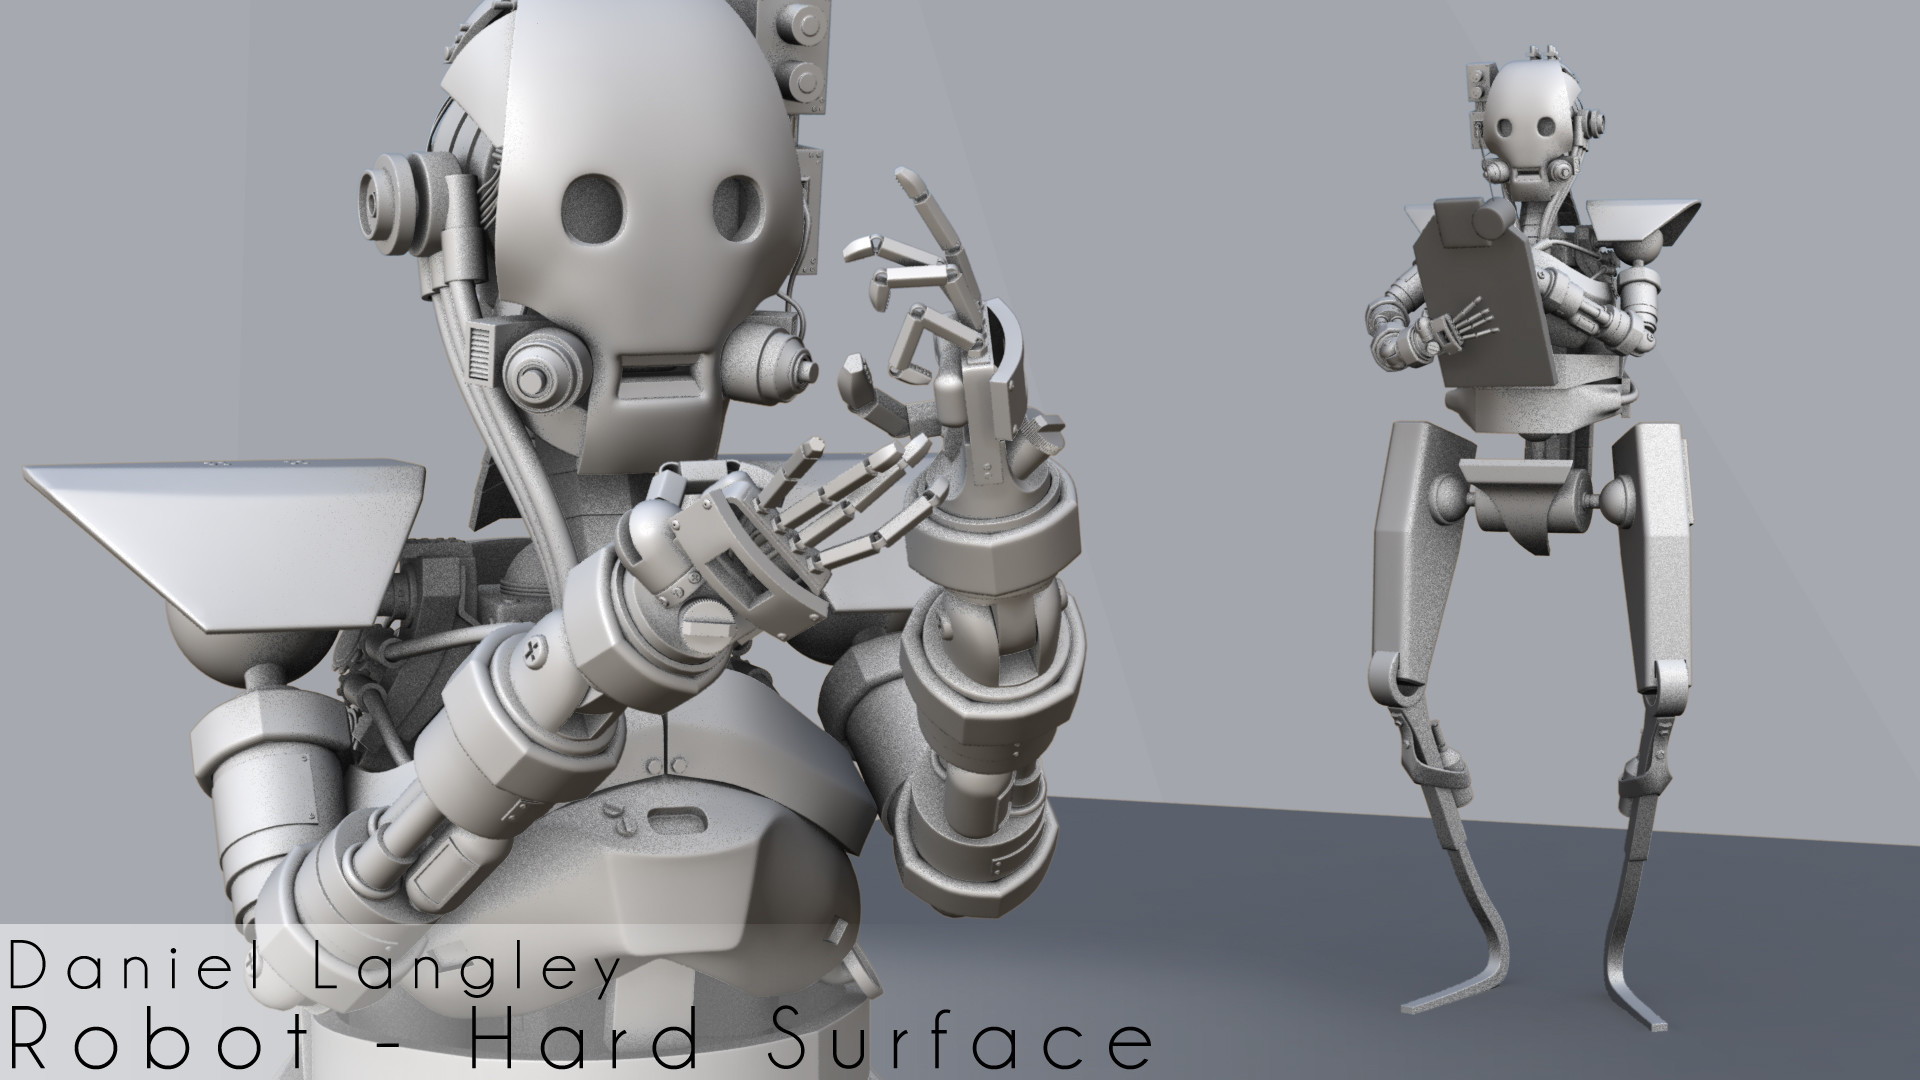 Daniel Langley - Robot - Hard Surface